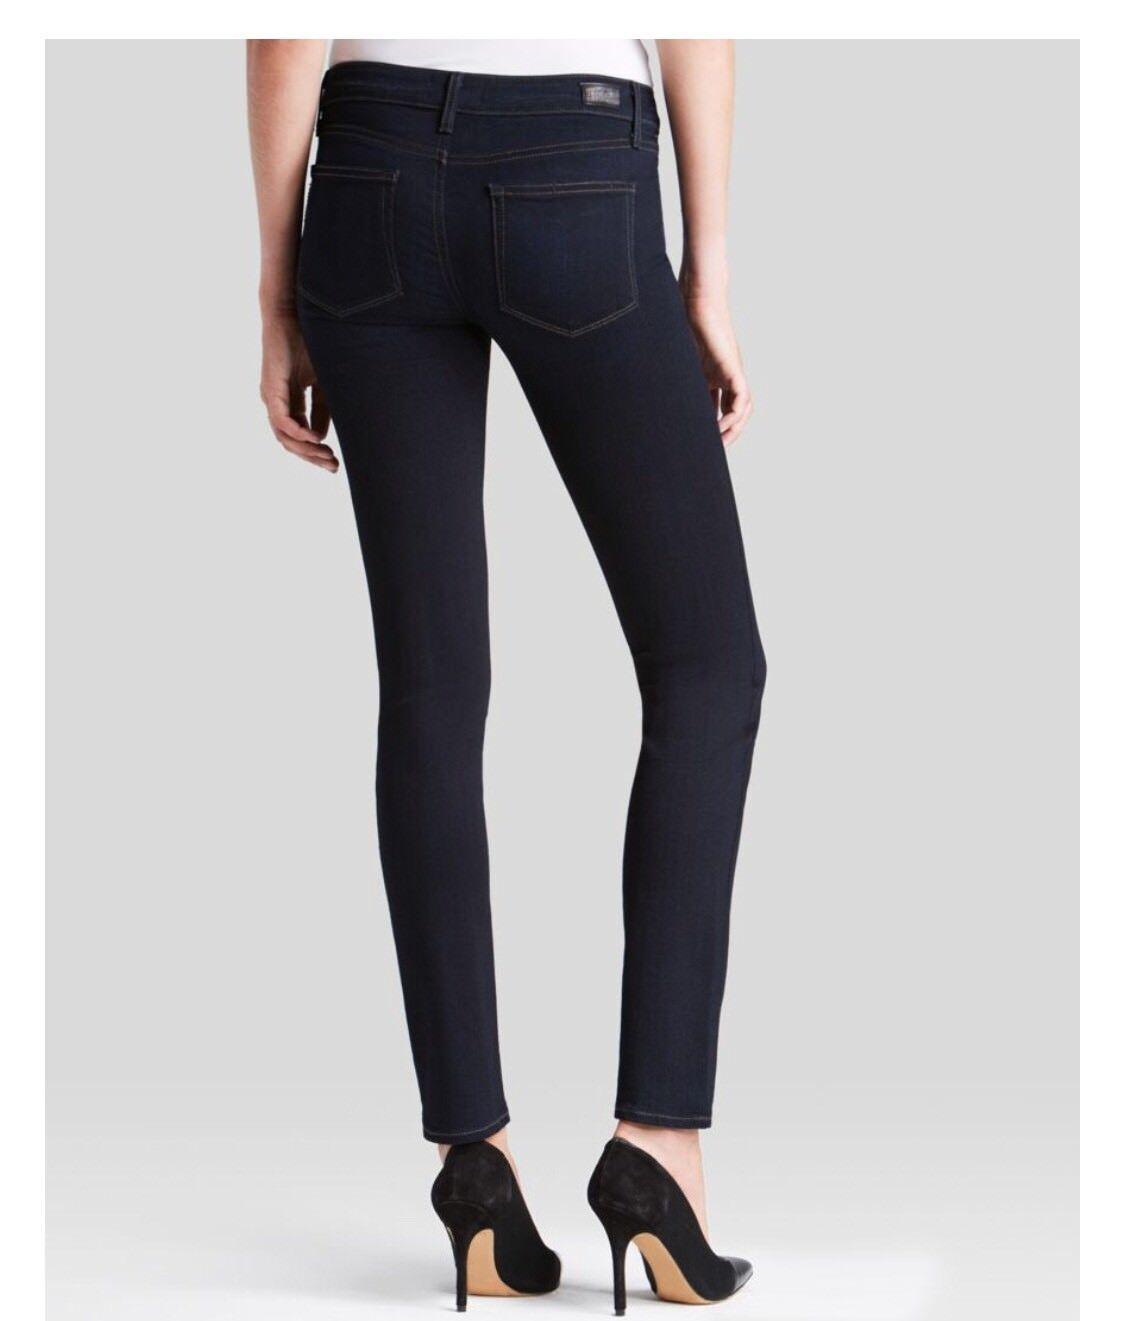 Brand New PAIGE Transcend Skyline Skinny Jeans In Mona Dark bluee Size